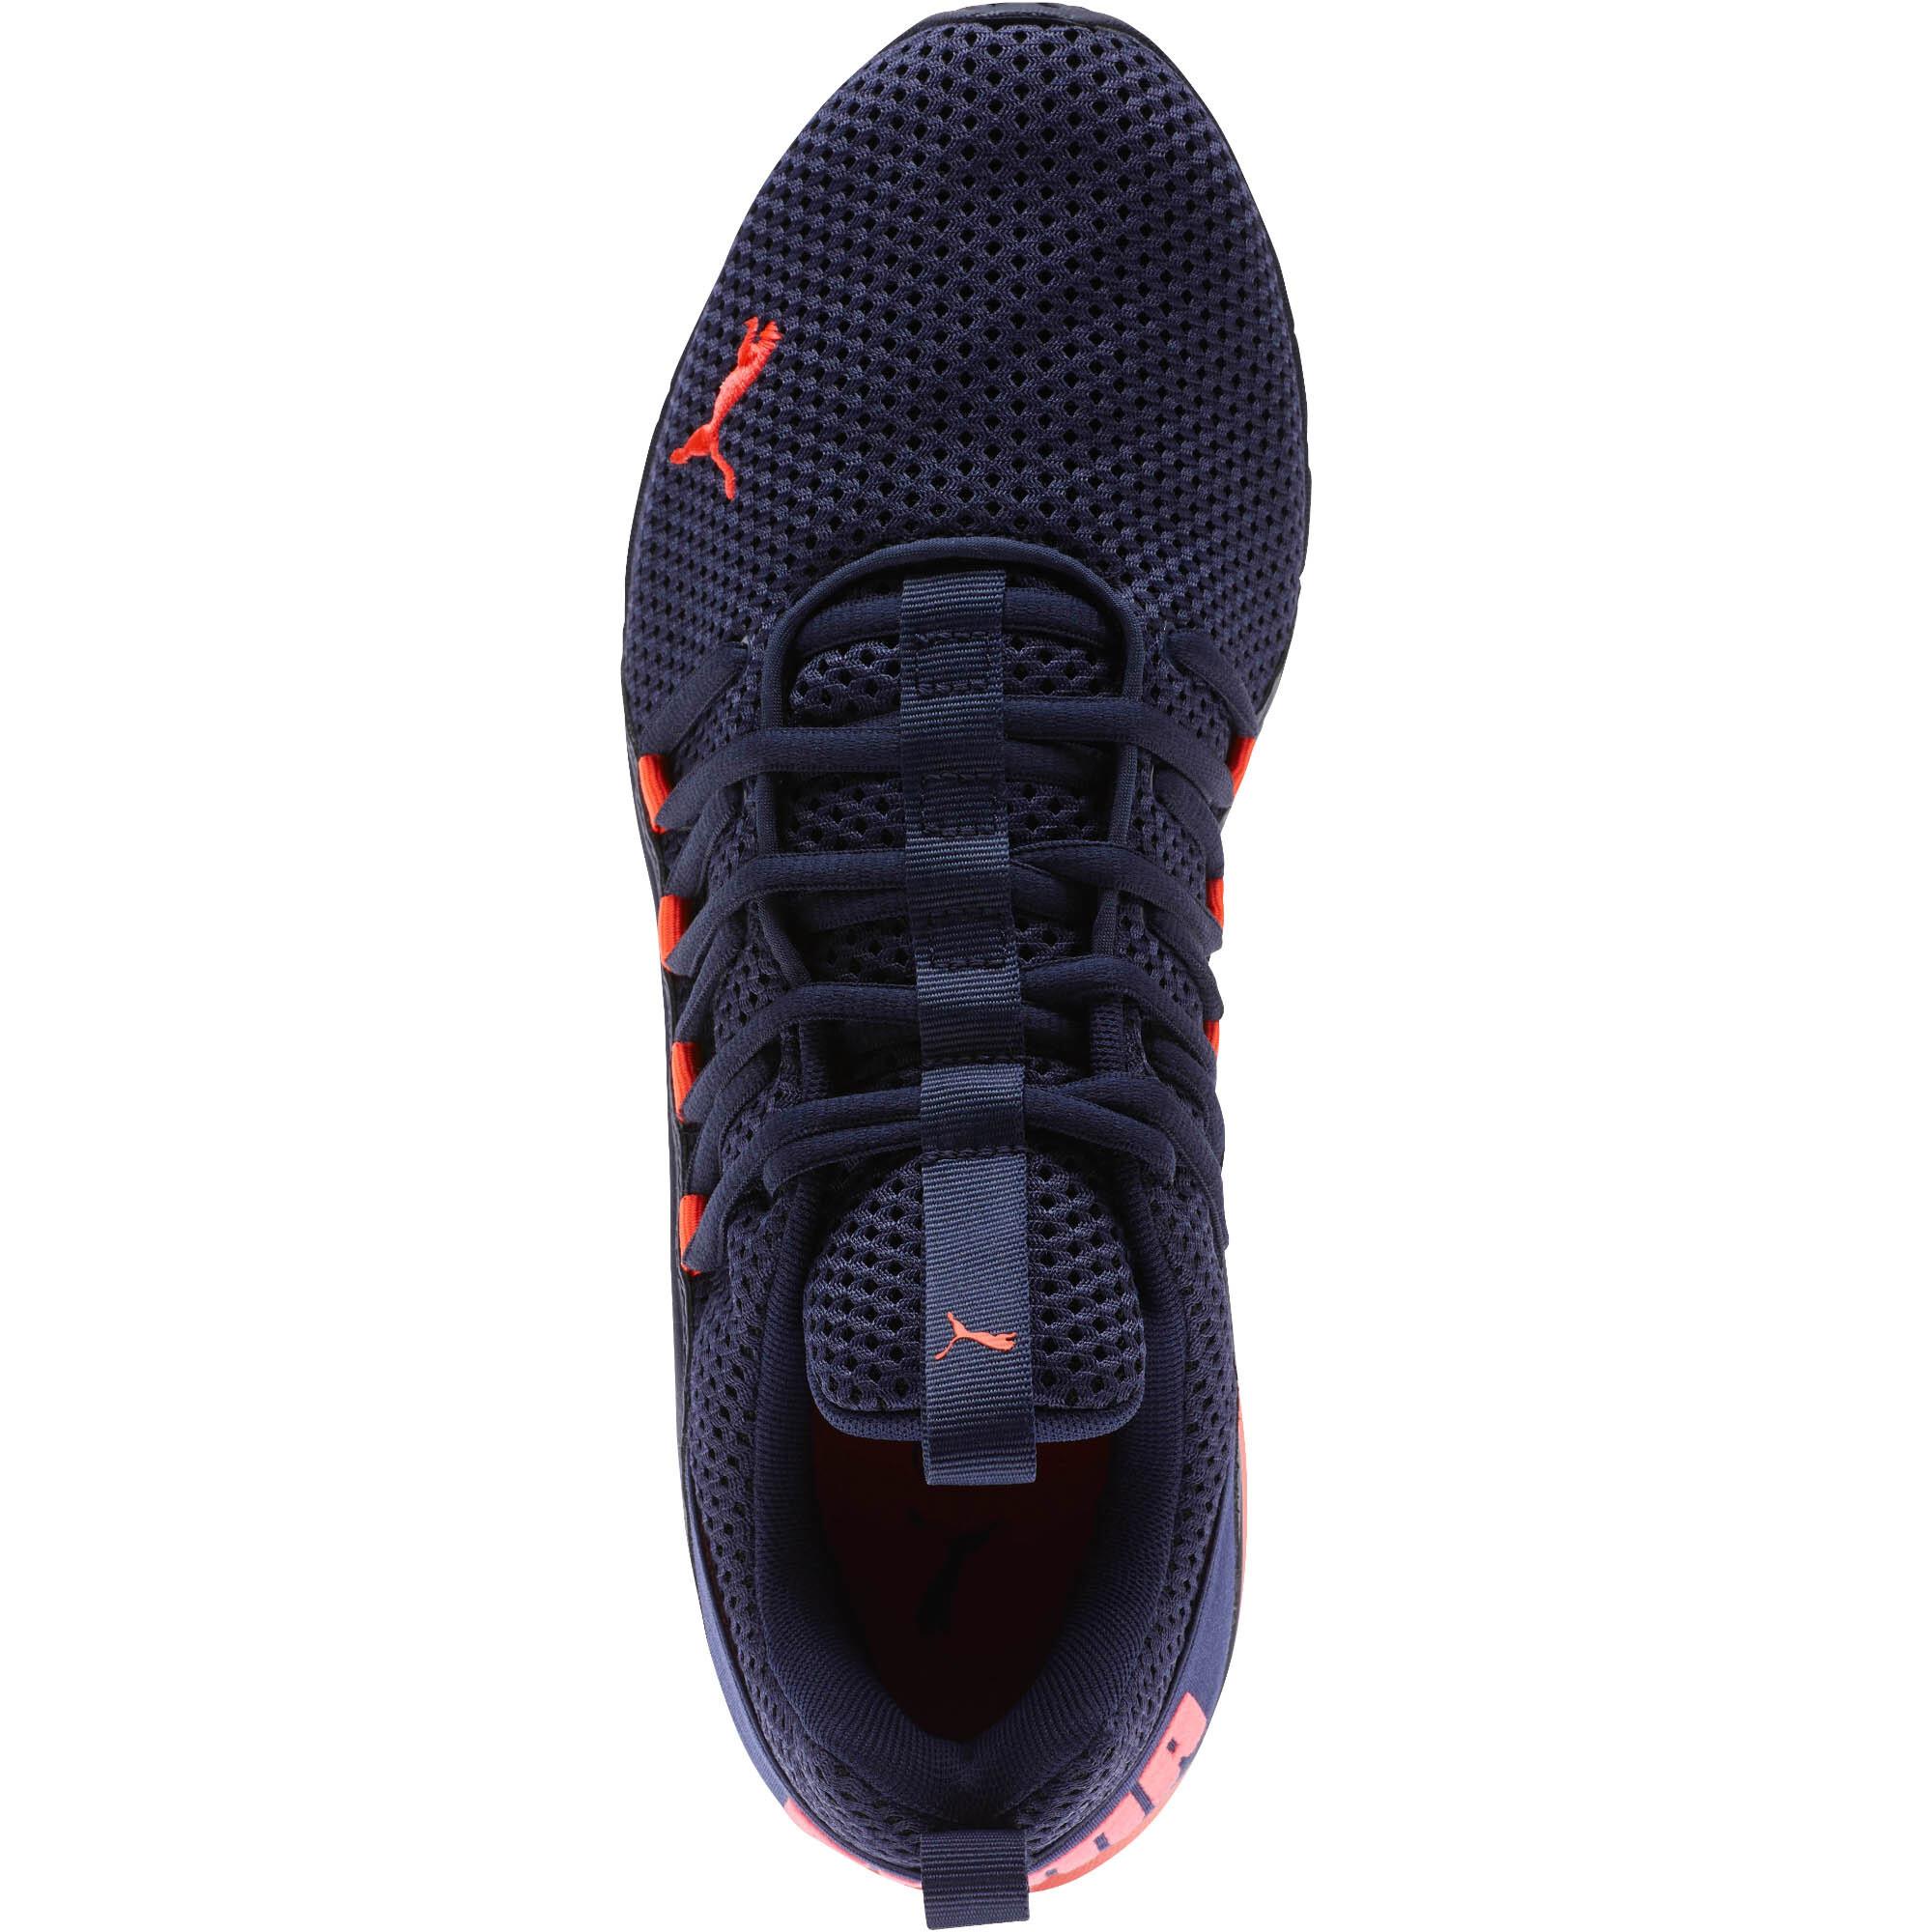 PUMA-Axelion-Breathe-Men-s-Training-Shoes-Men-Shoe-Running thumbnail 6